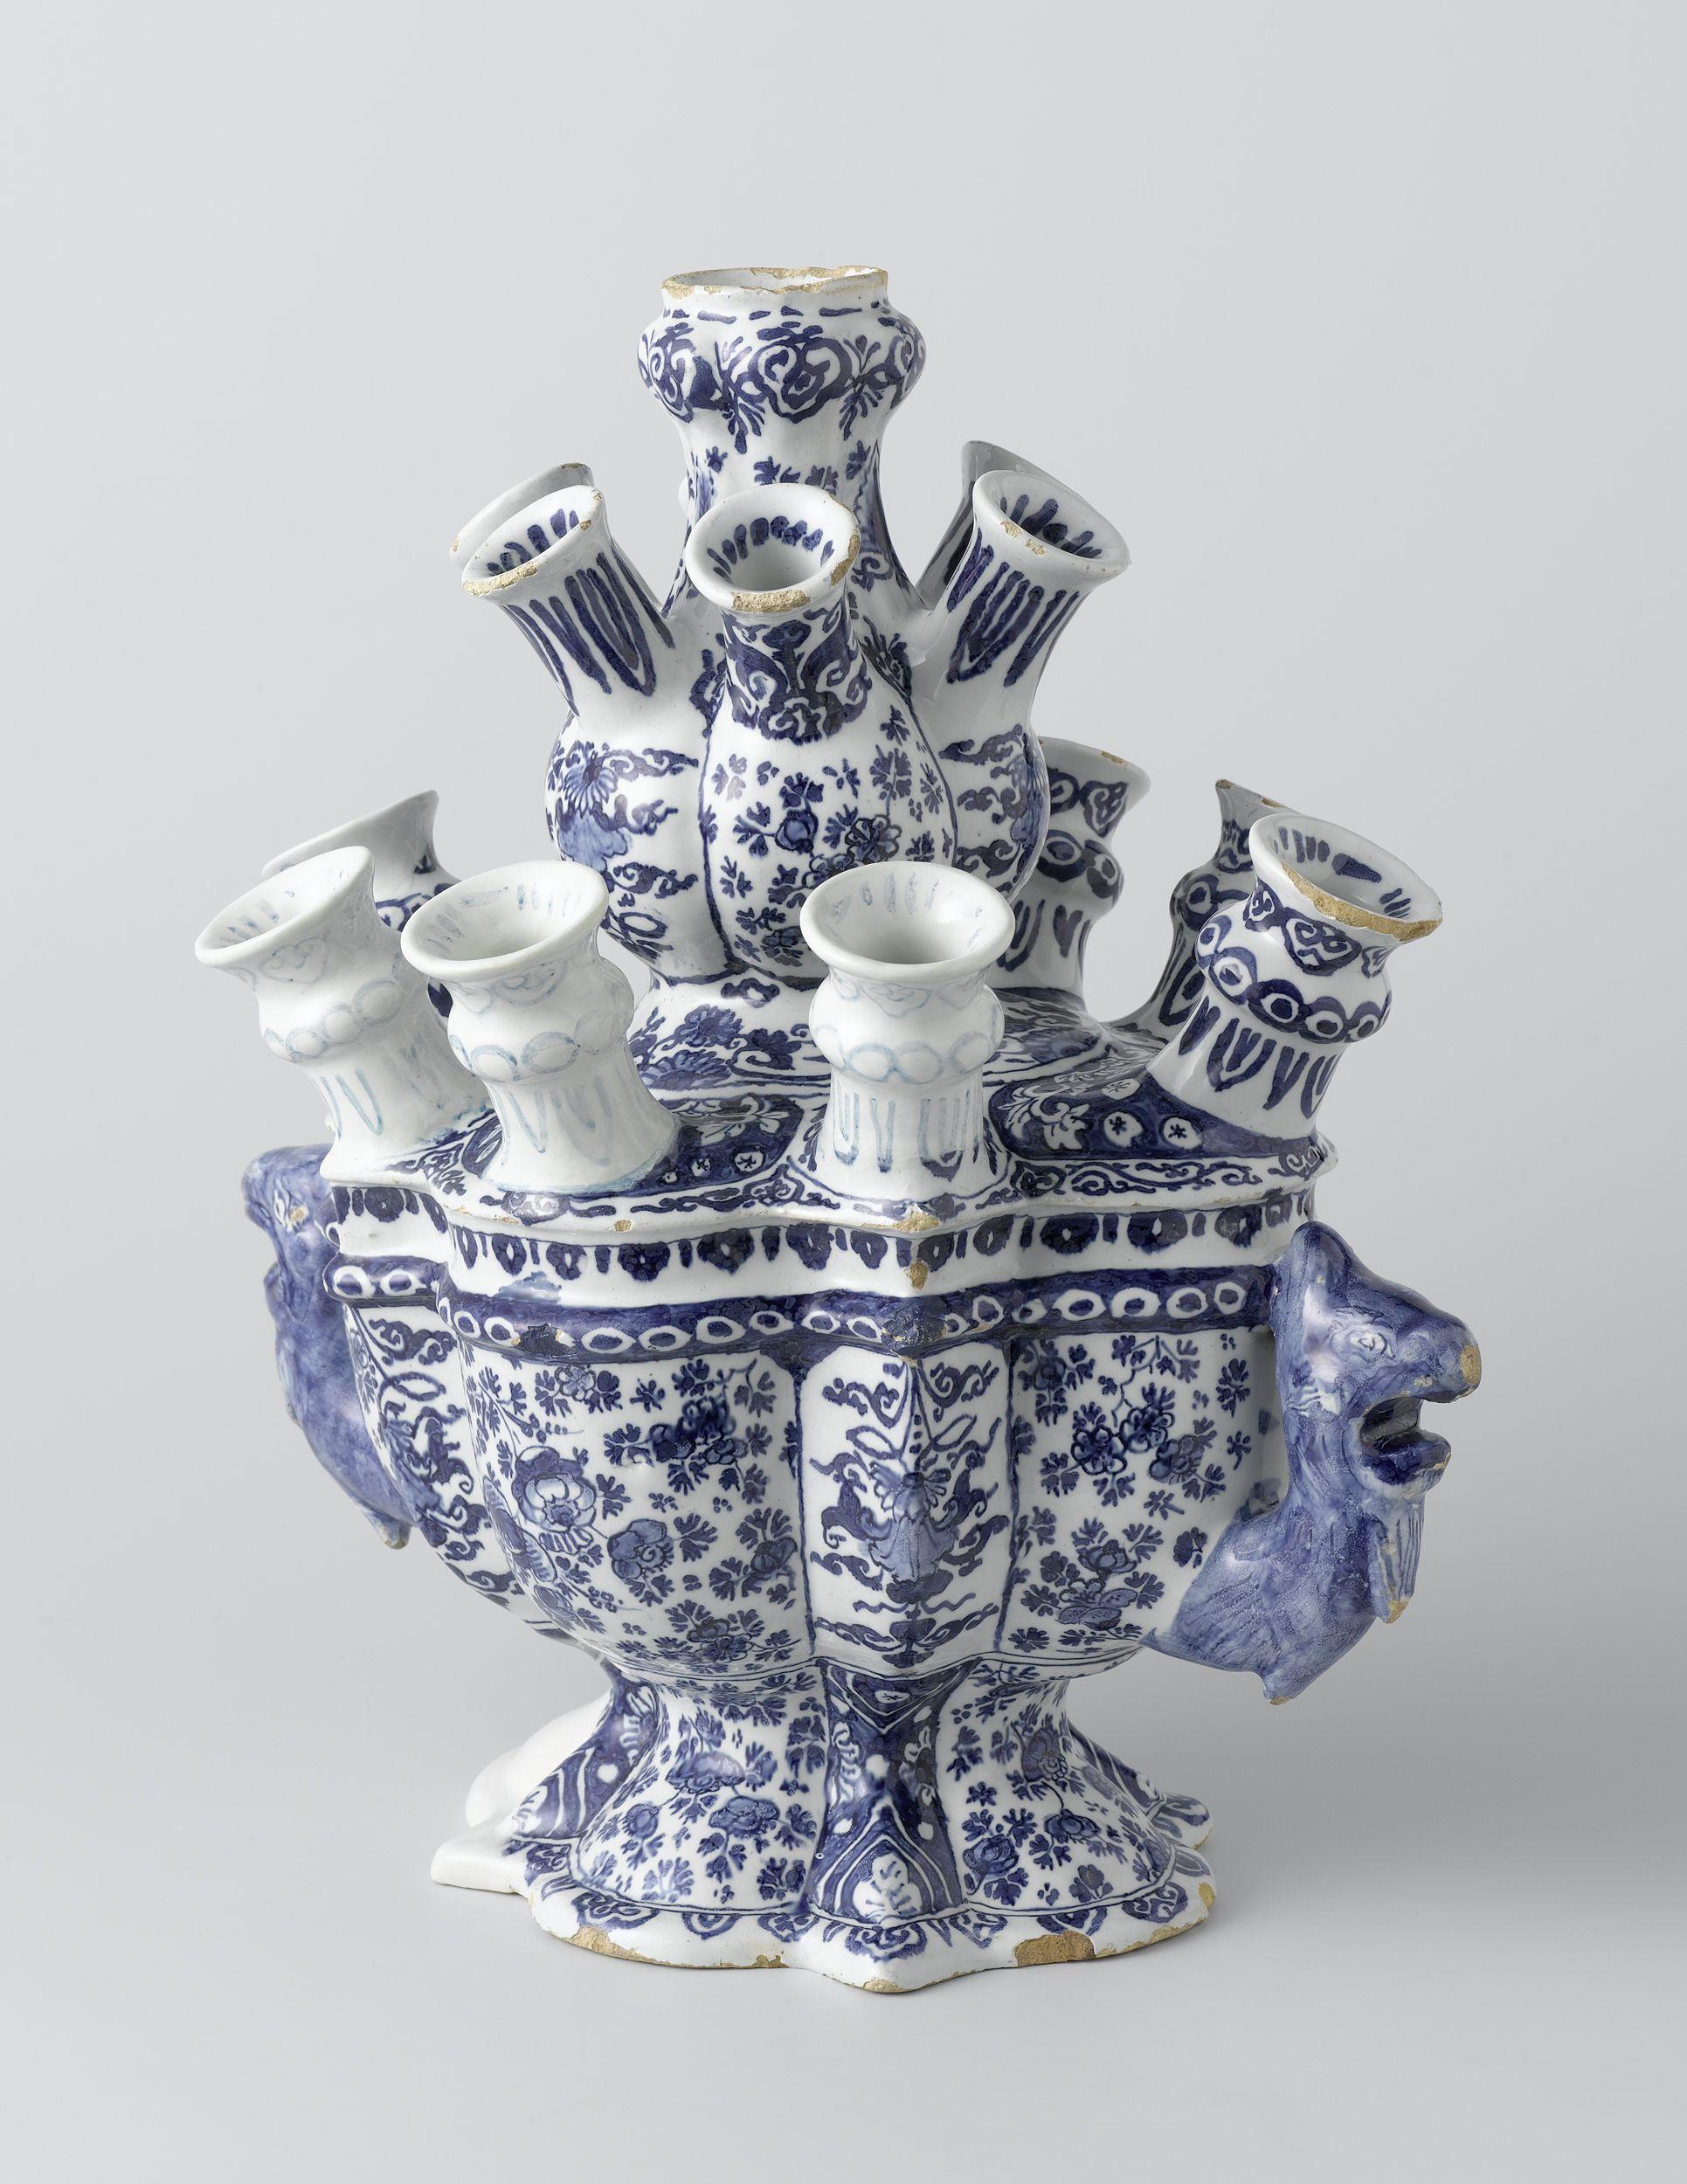 delft blue tulip vase ca 1690 1720 rijksmuseum. Black Bedroom Furniture Sets. Home Design Ideas